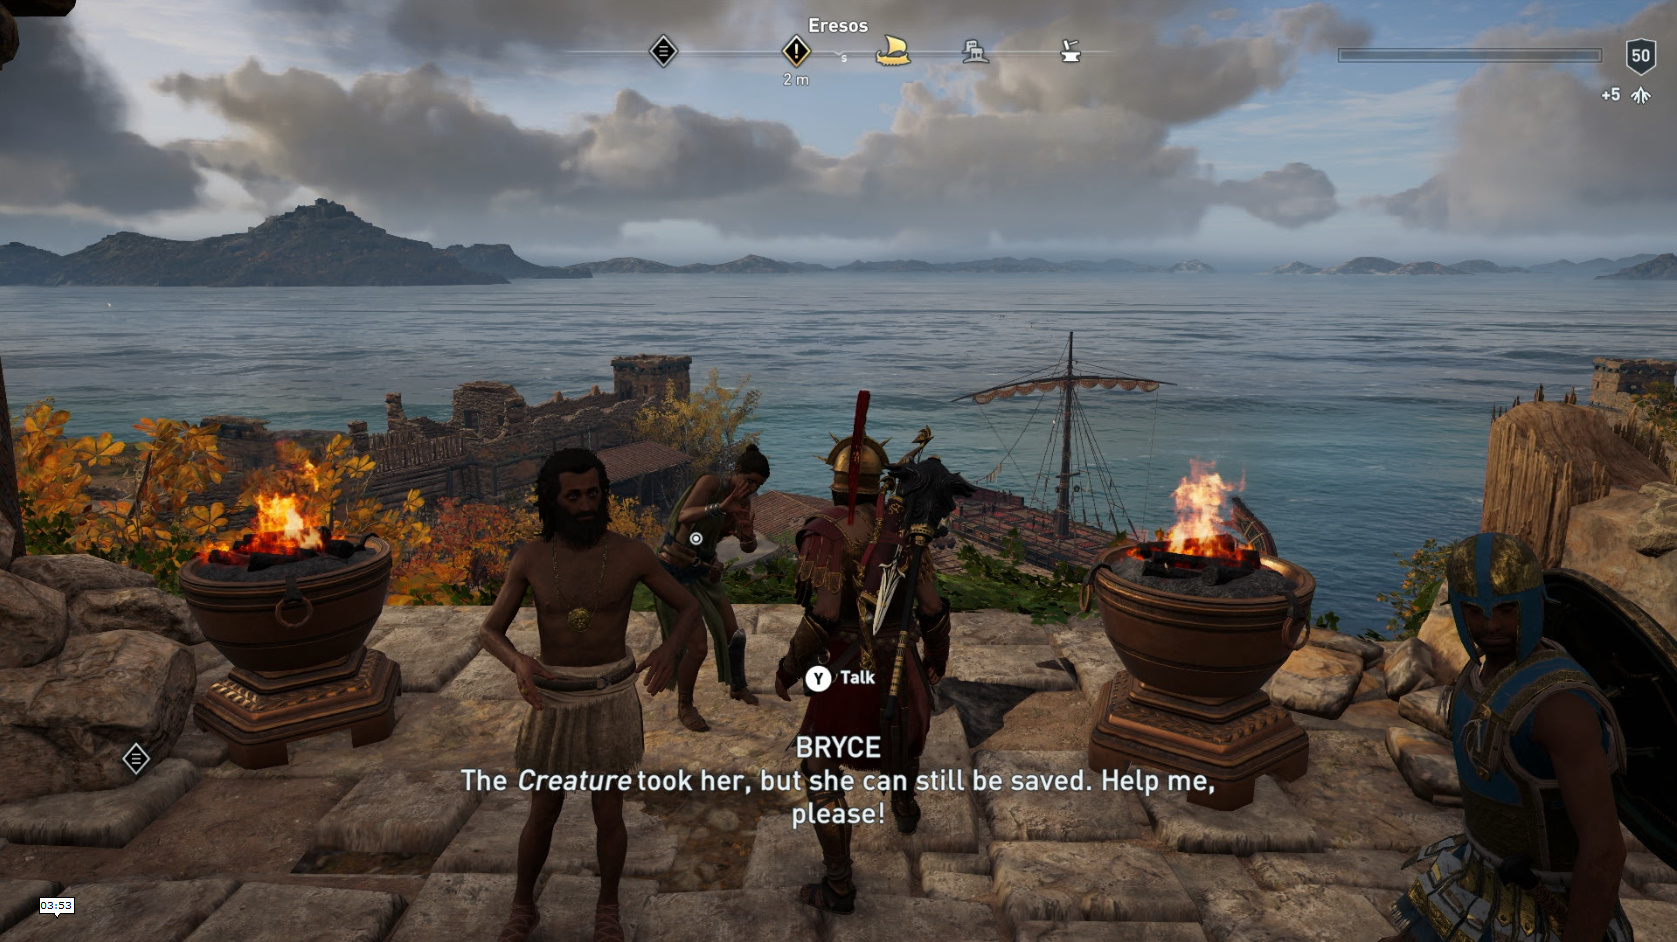 Eresosの街で男たちに責められている女性Bryceを発見